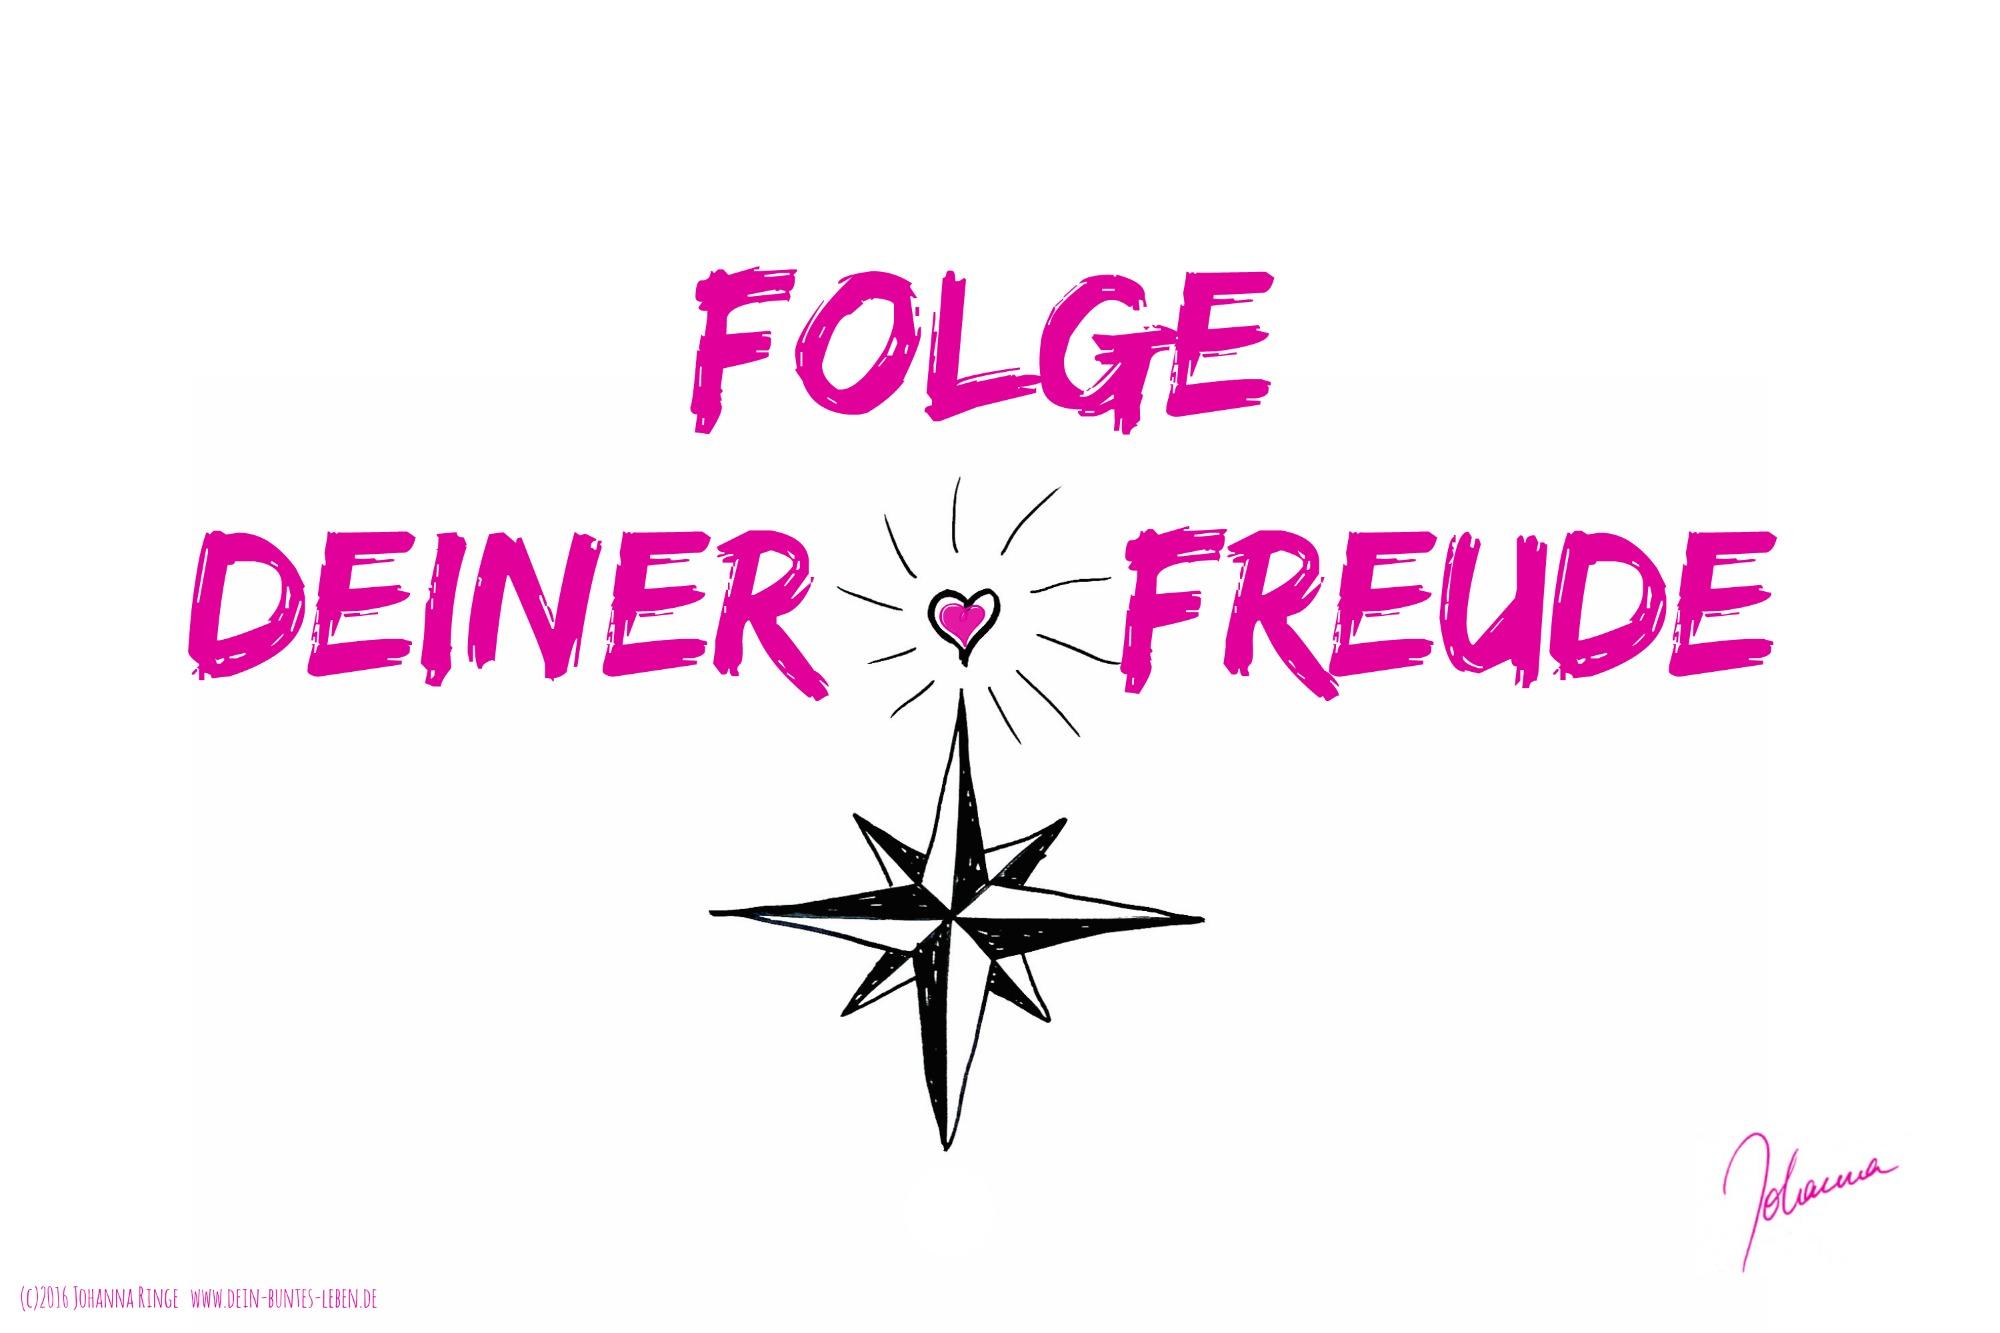 Folge Deiner Freude! (c)2016 Johanna Ringe www.dein-buntes-leben.de www.vielbegabt.coach